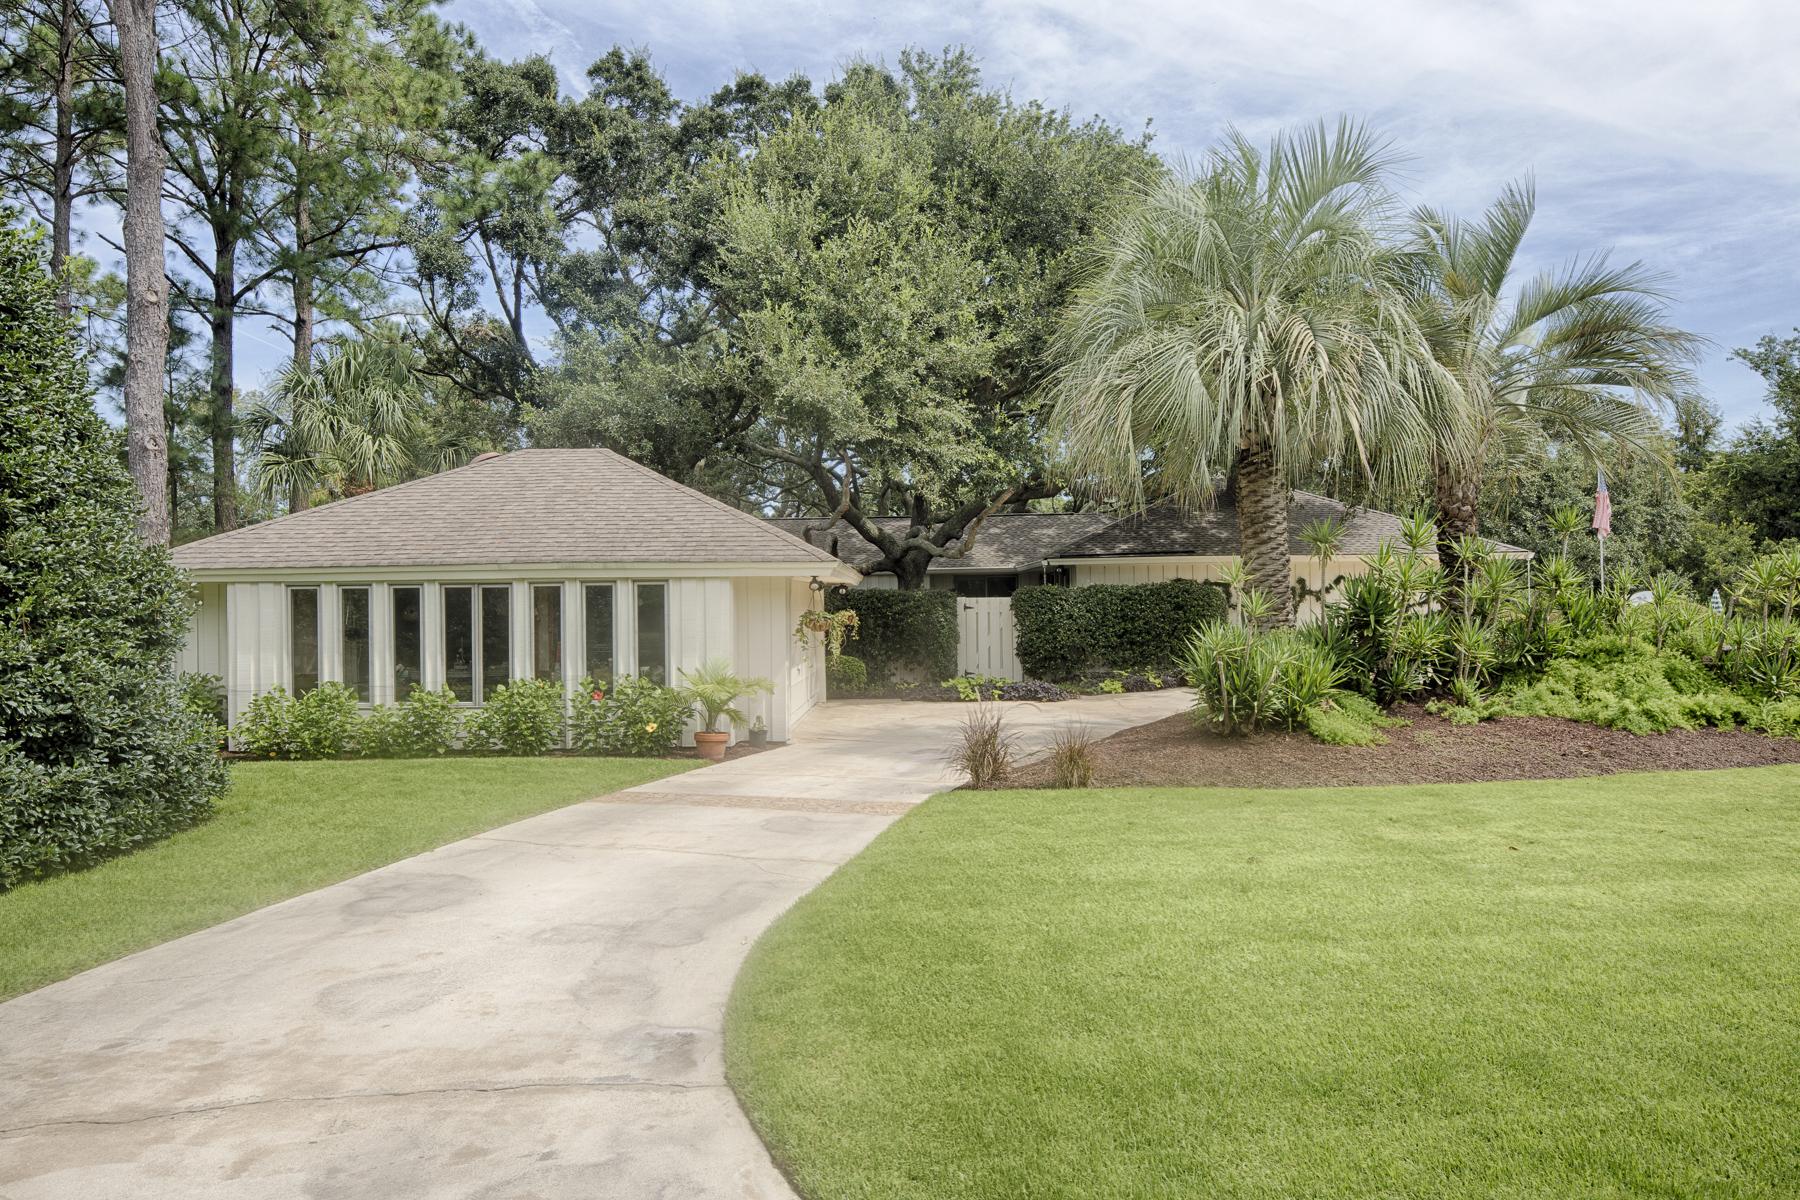 Single Family Home for Sale at Port Royal 2 Everglade Place Hilton Head Island, South Carolina 29928 United States